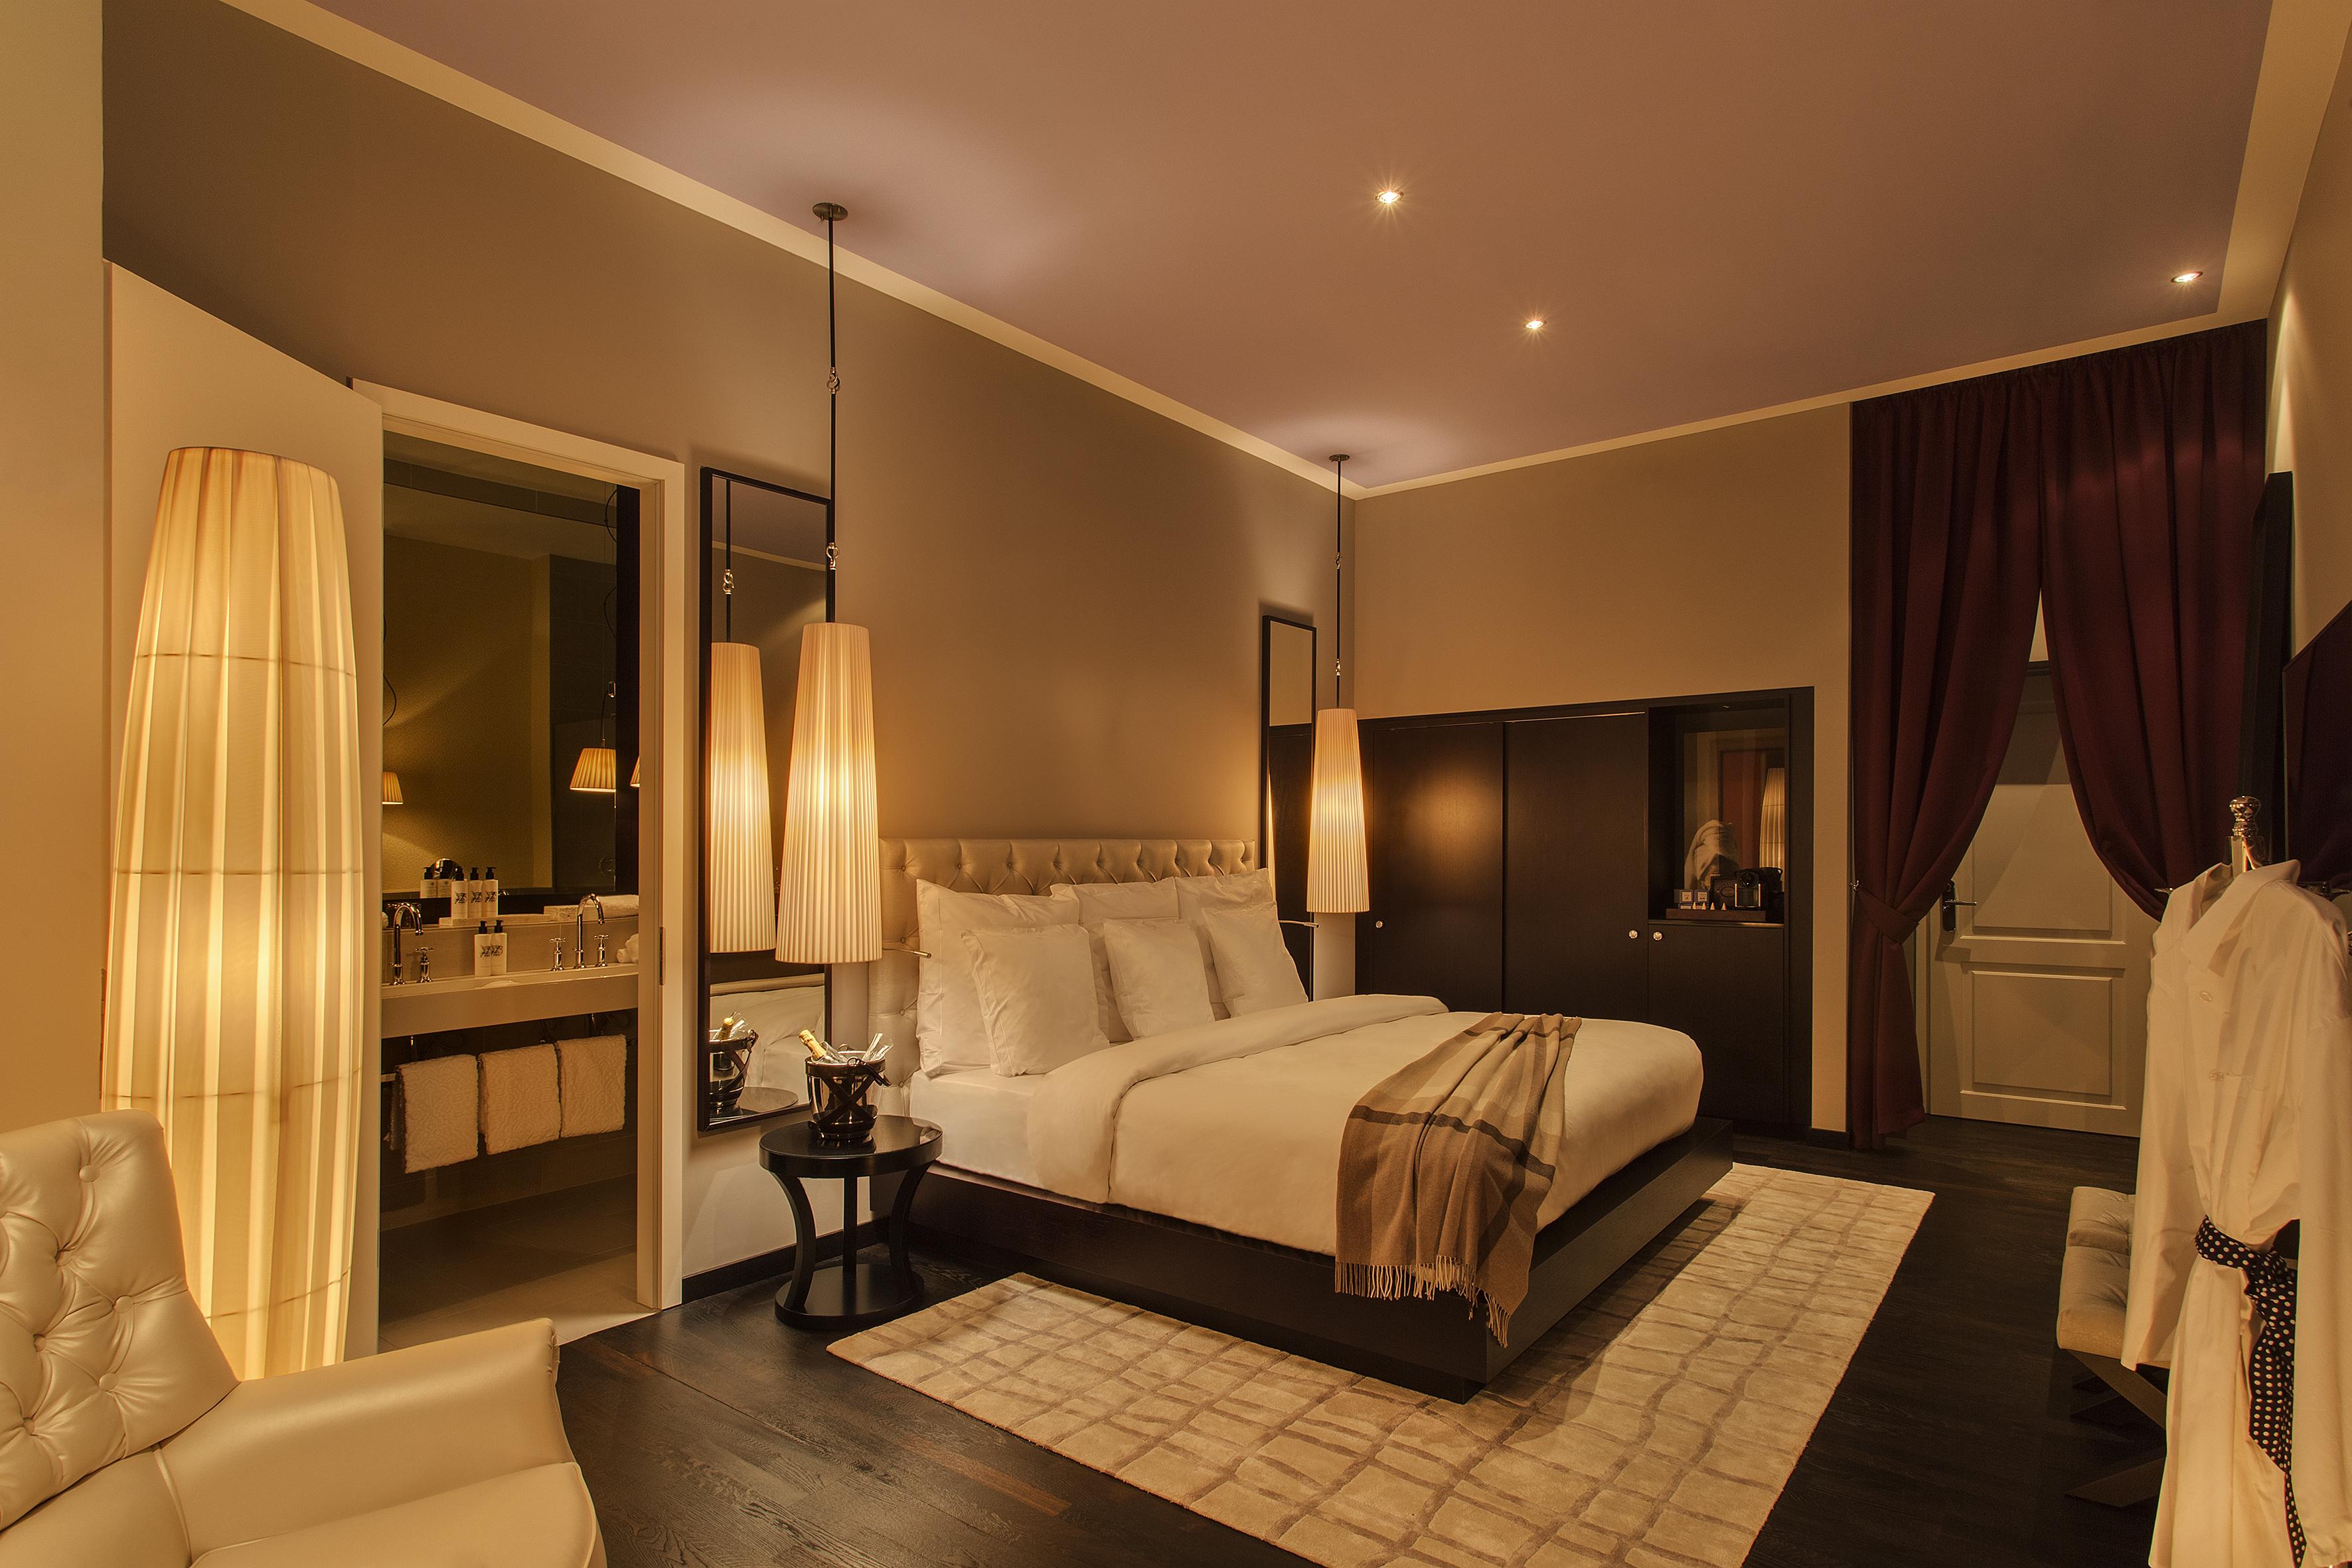 hotel-zoo-berlin_18352142296_o